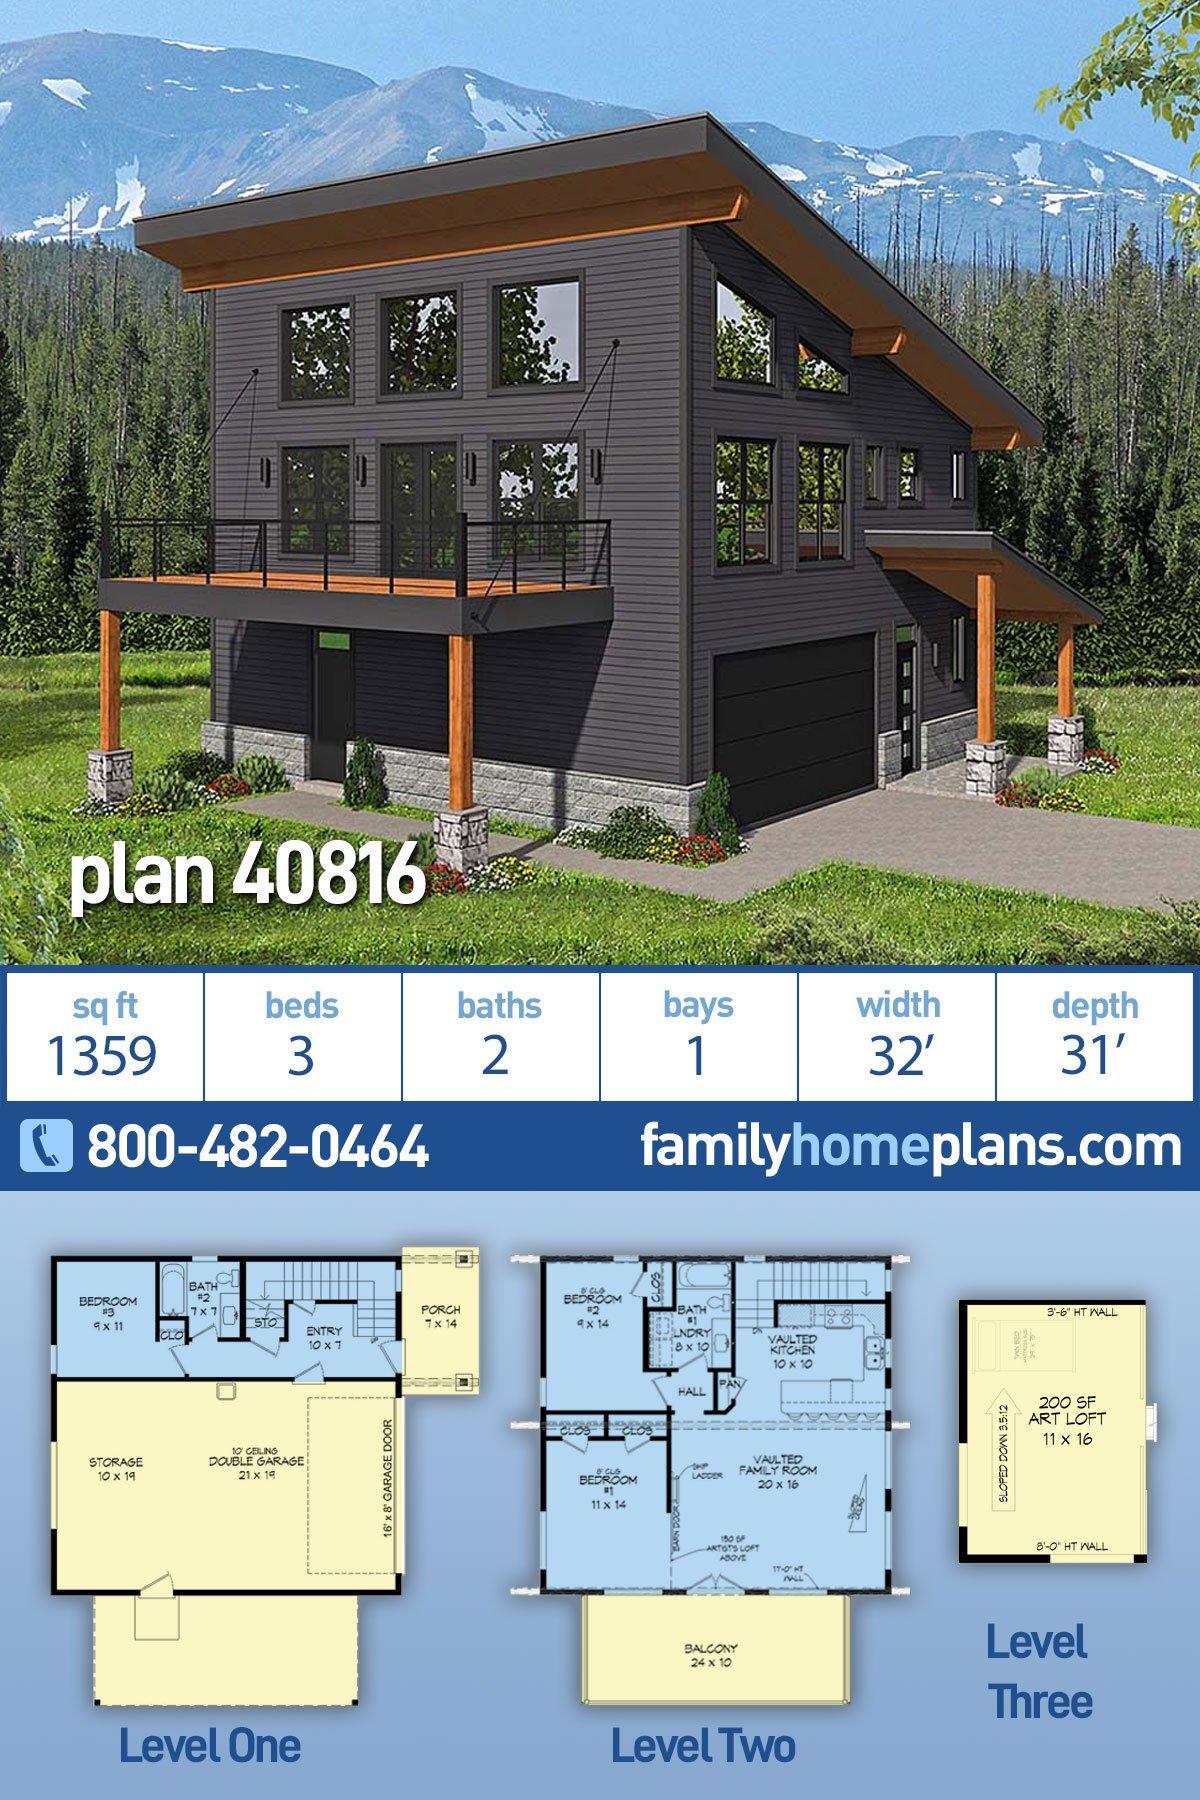 Contemporary, Modern Garage-Living Plan 40816 with 3 Beds, 2 Baths, 2 Car Garage